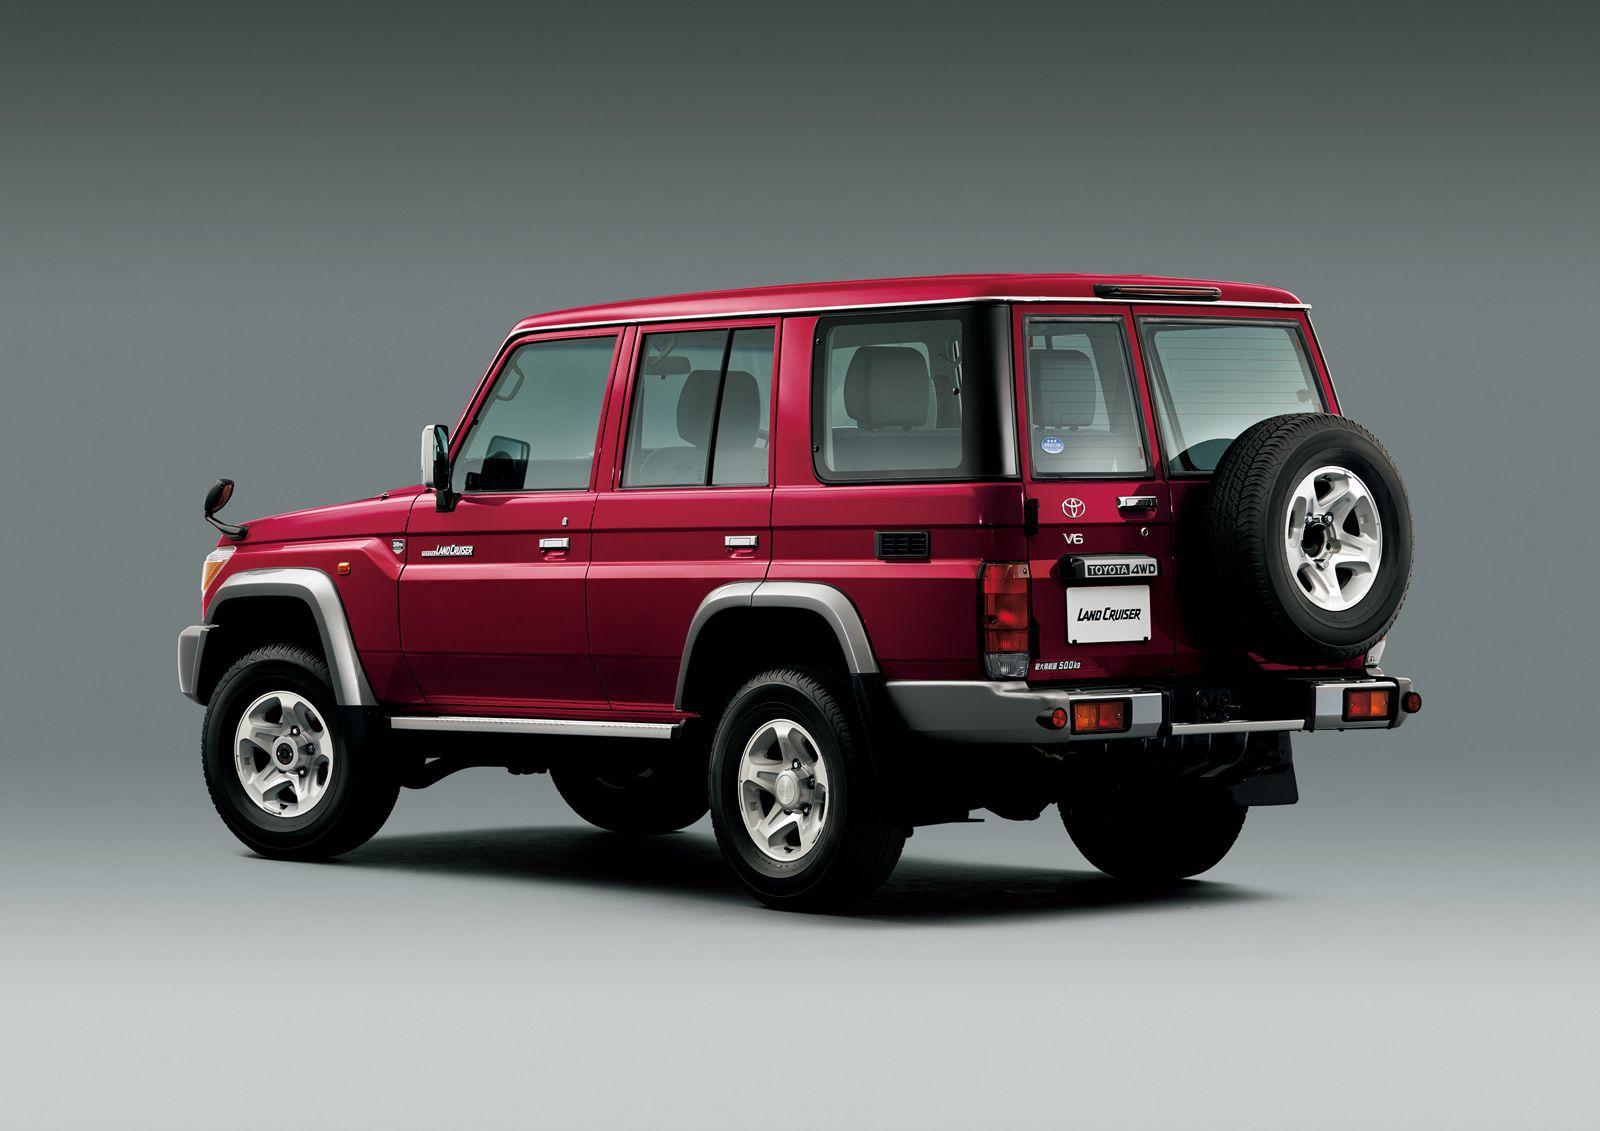 Toyota-Land-Cruiser-70-Series-22